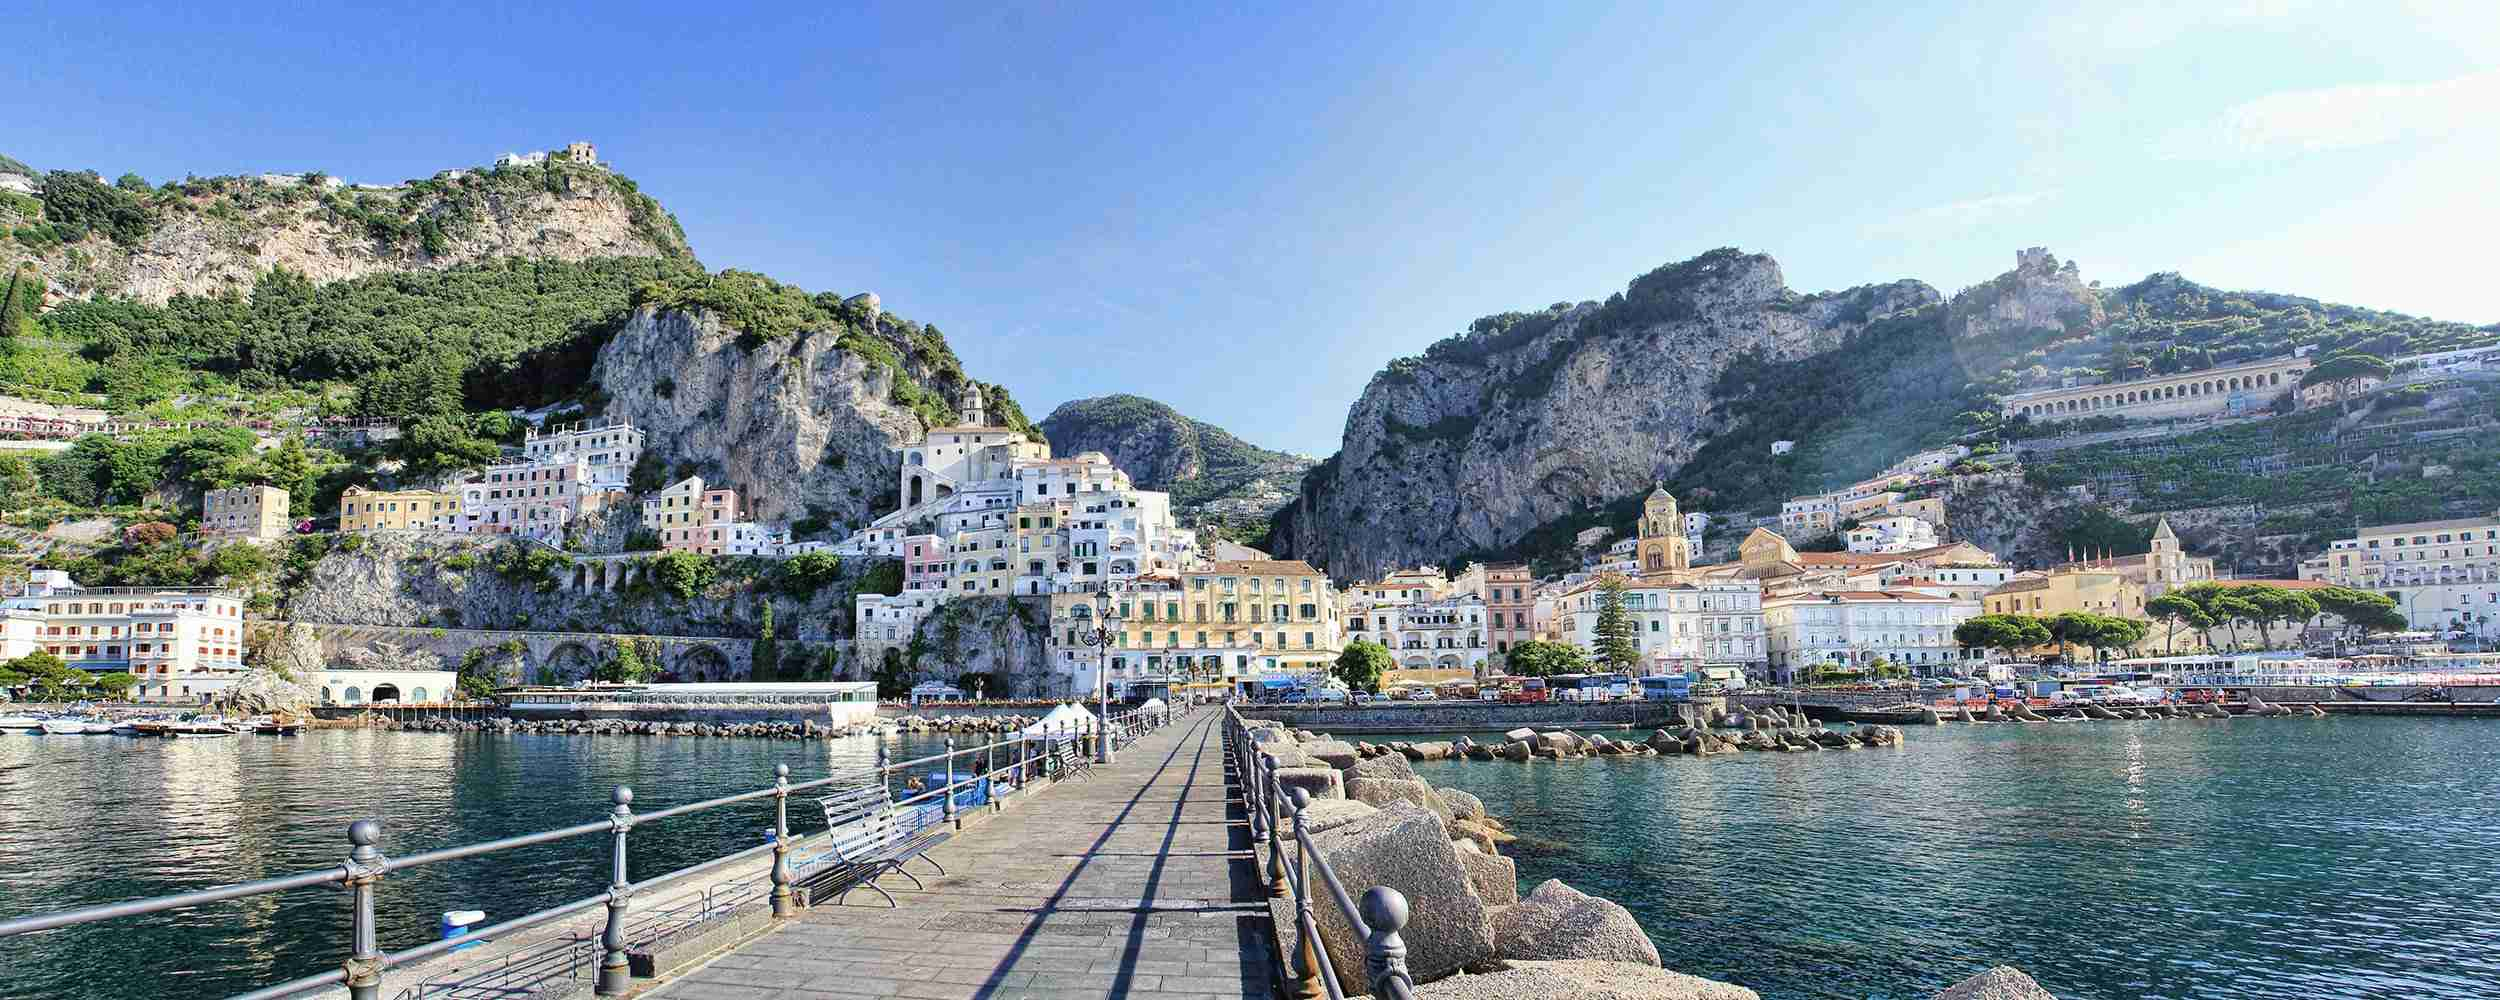 Visita guidata alla costiera Amalfitana